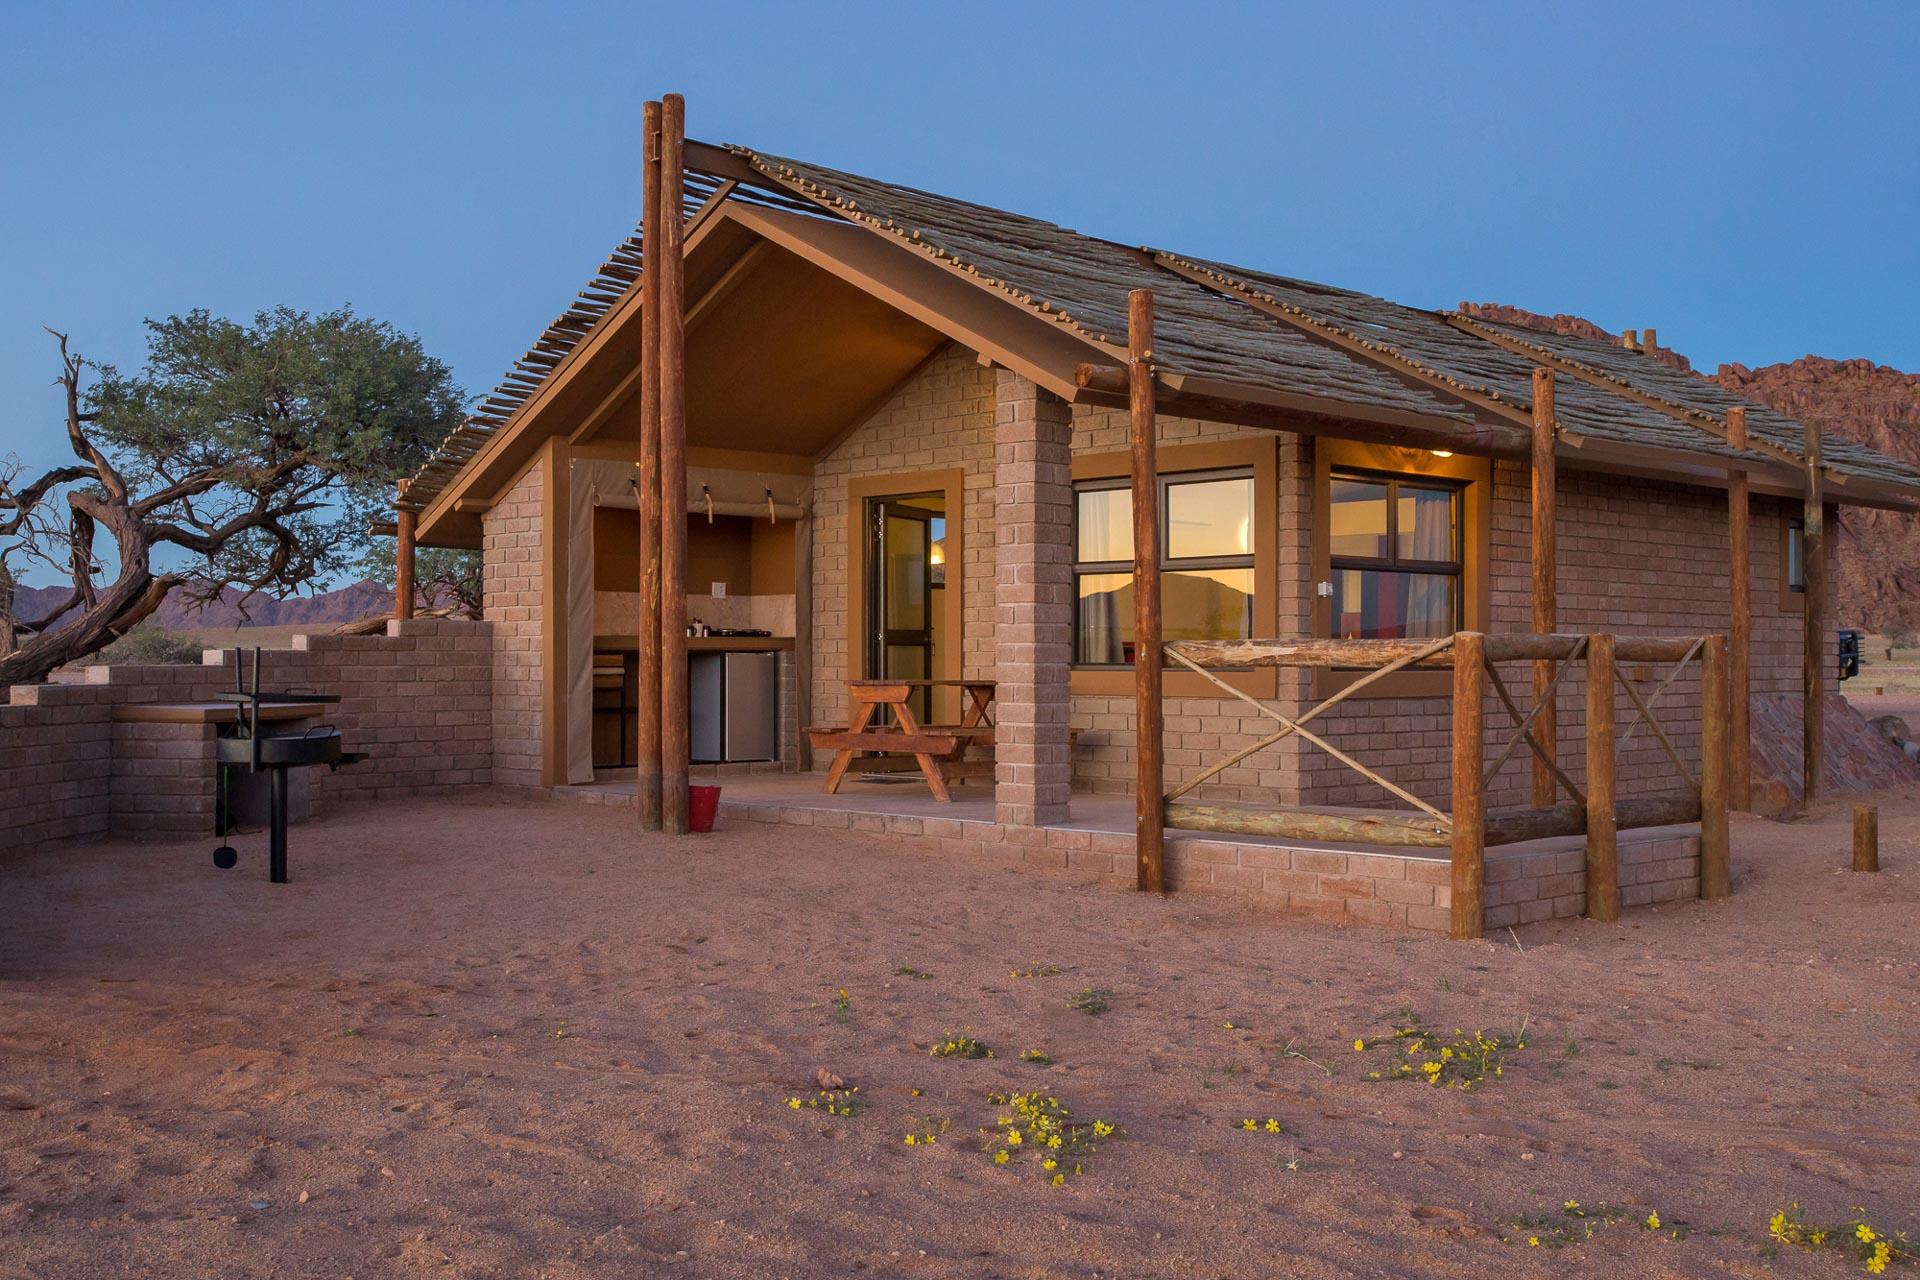 Desert-Camp-Namibia-80